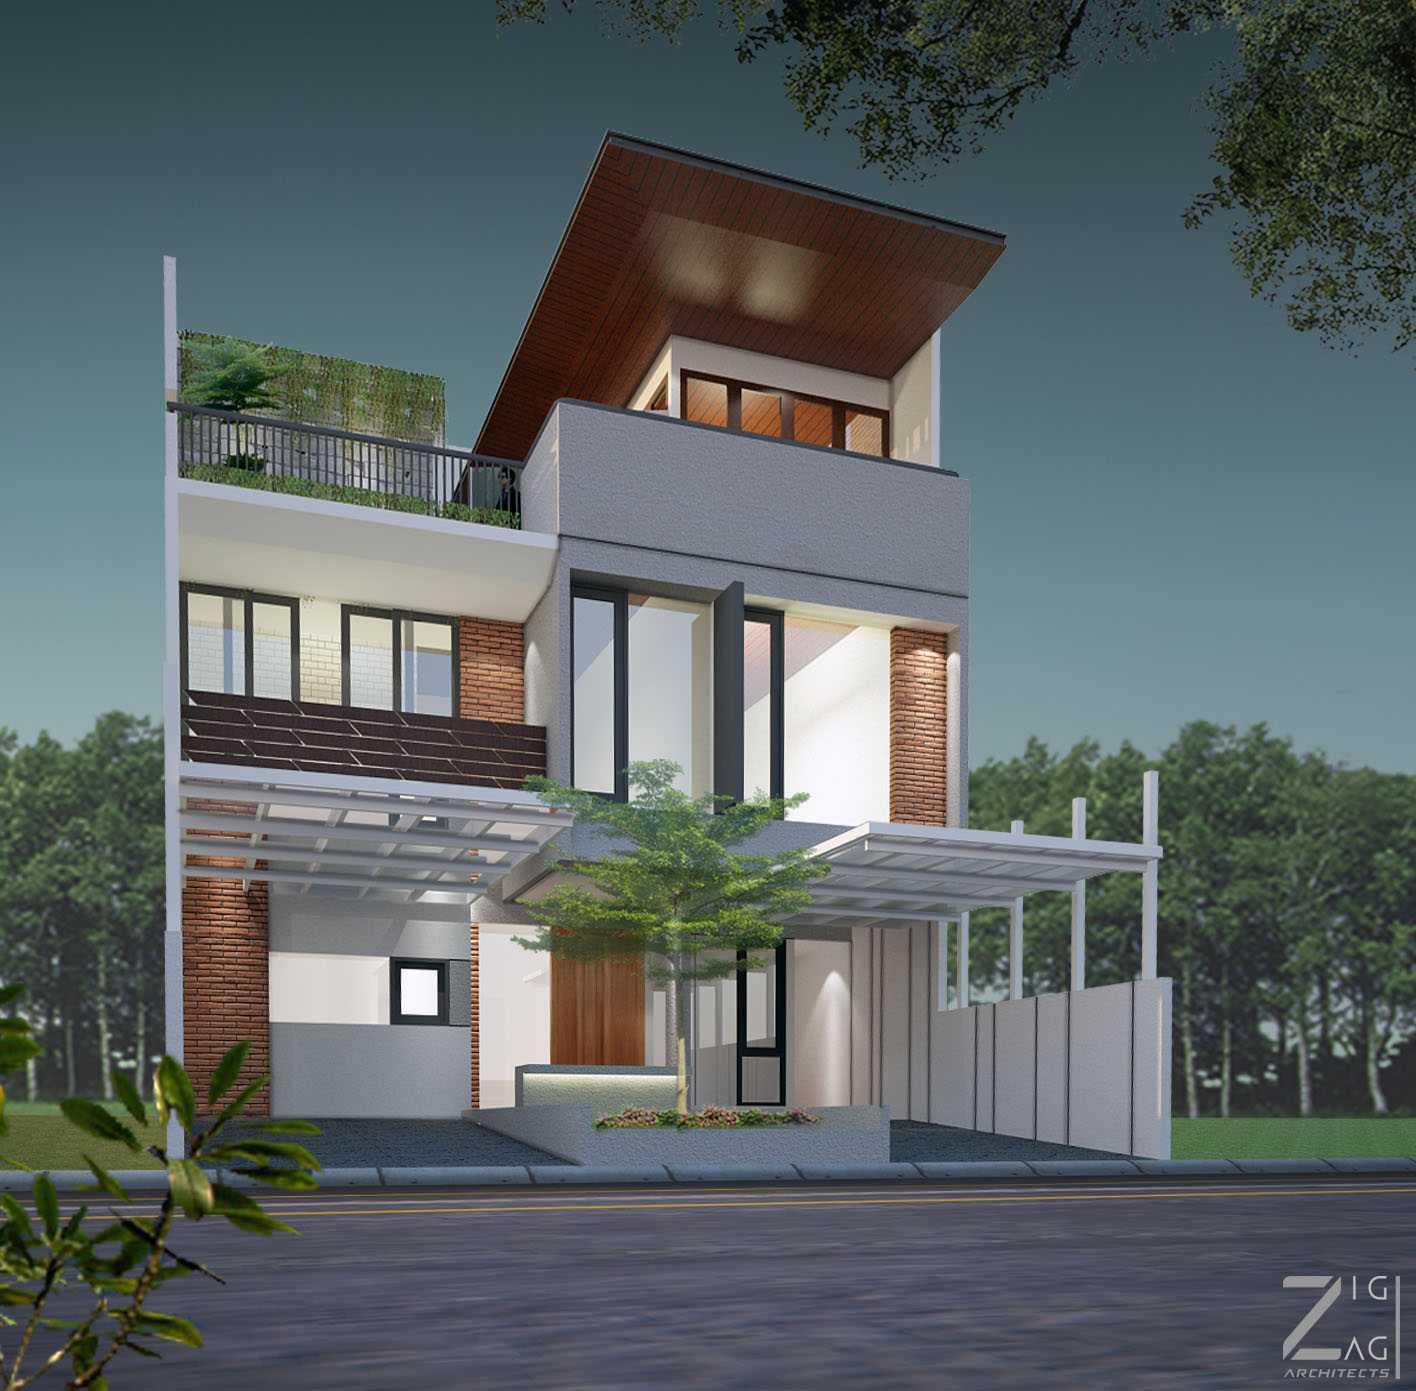 Zigzag Architecture Studio Pulomas House Daerah Khusus Ibukota Jakarta, Indonesia  04-1  37597